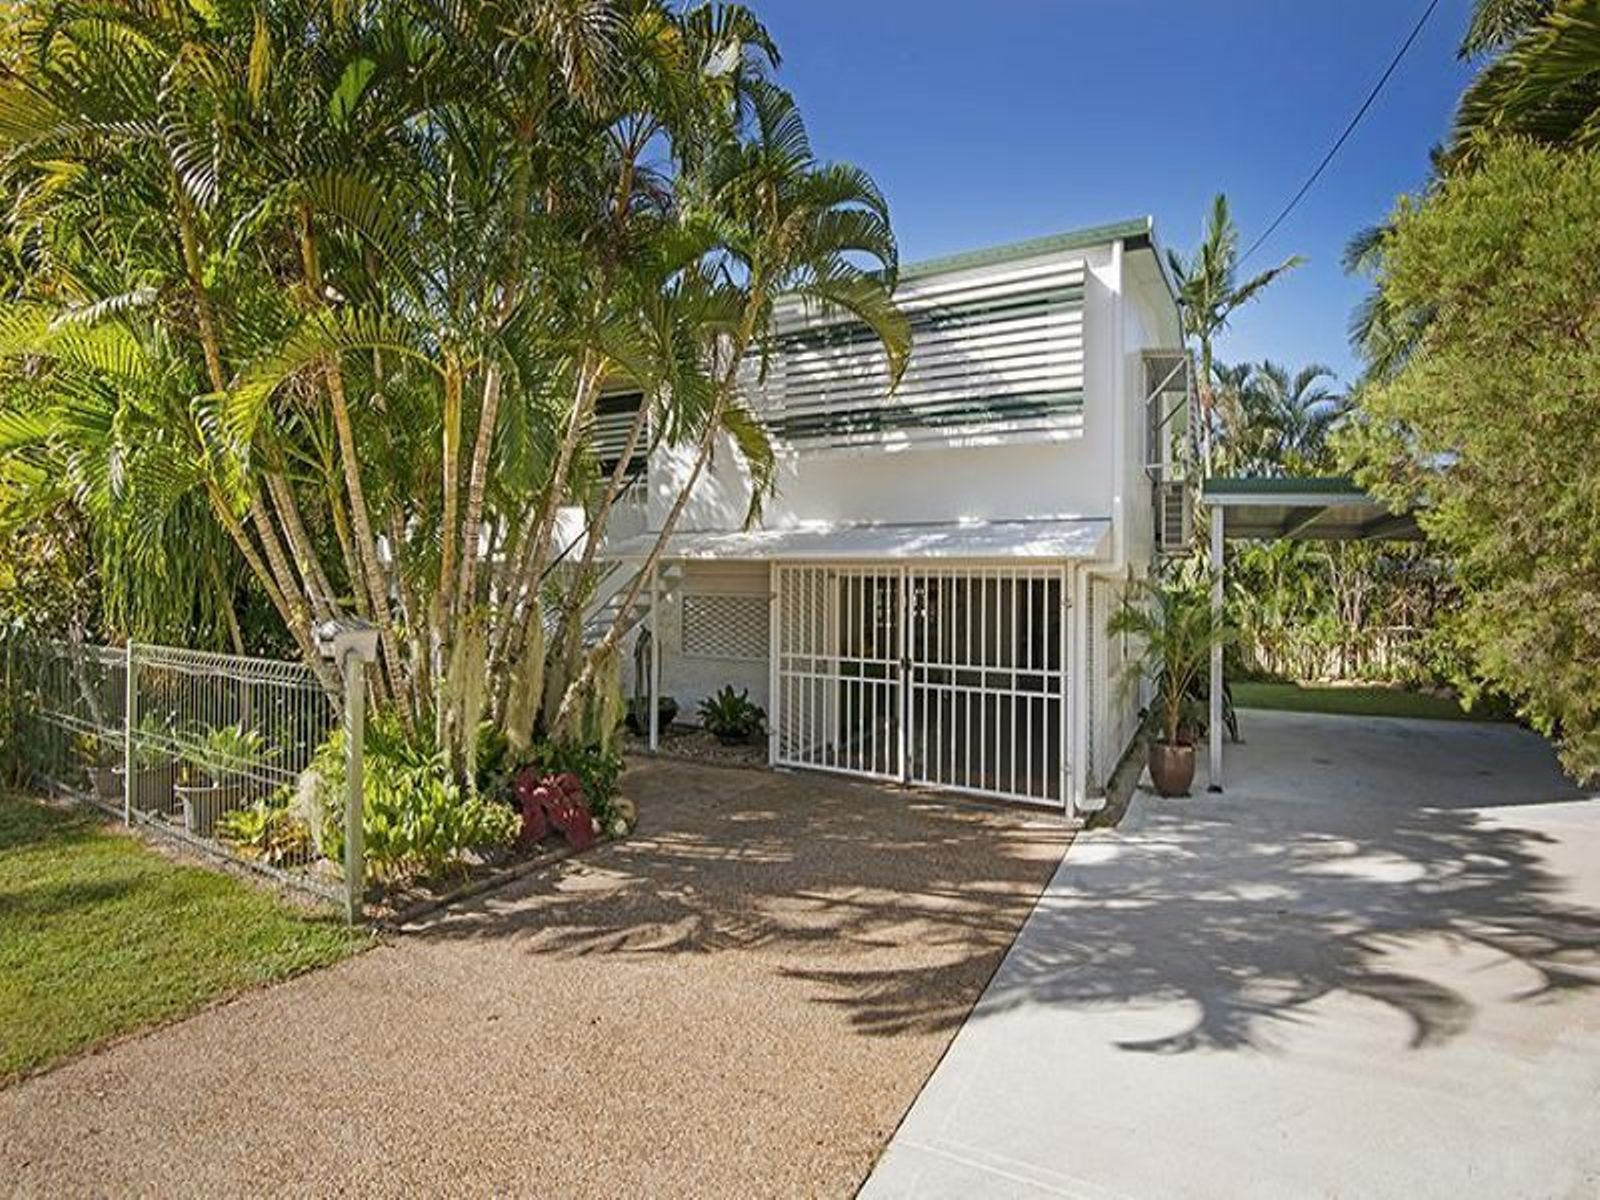 22 Faraday Street, Wulguru, QLD 4811